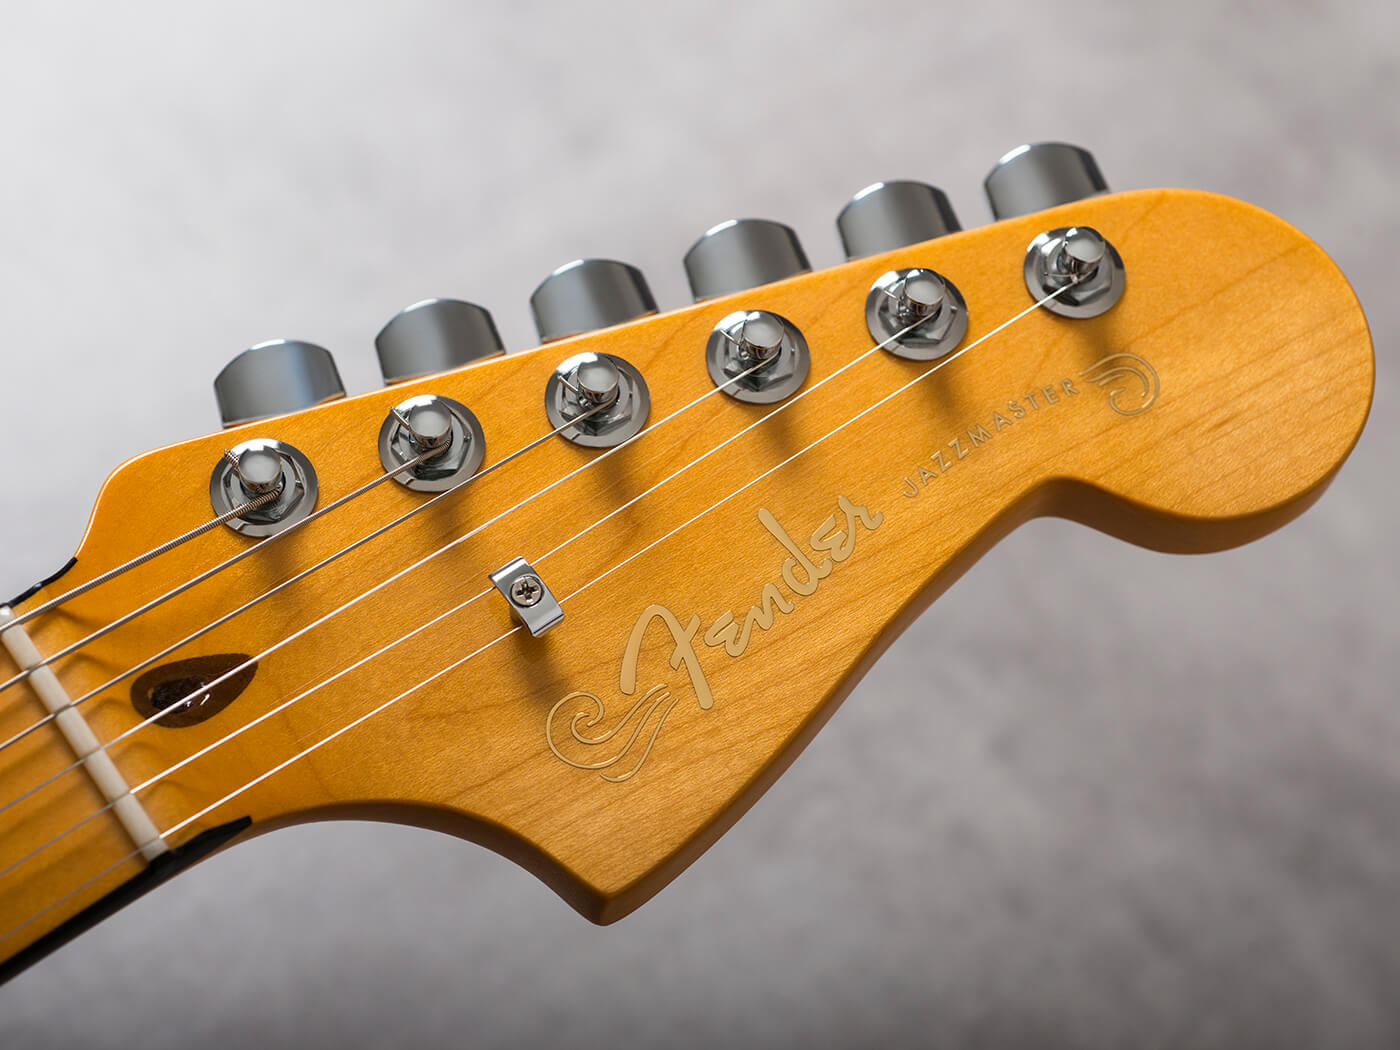 Fender Ultra Jazzmaster (Headstock)